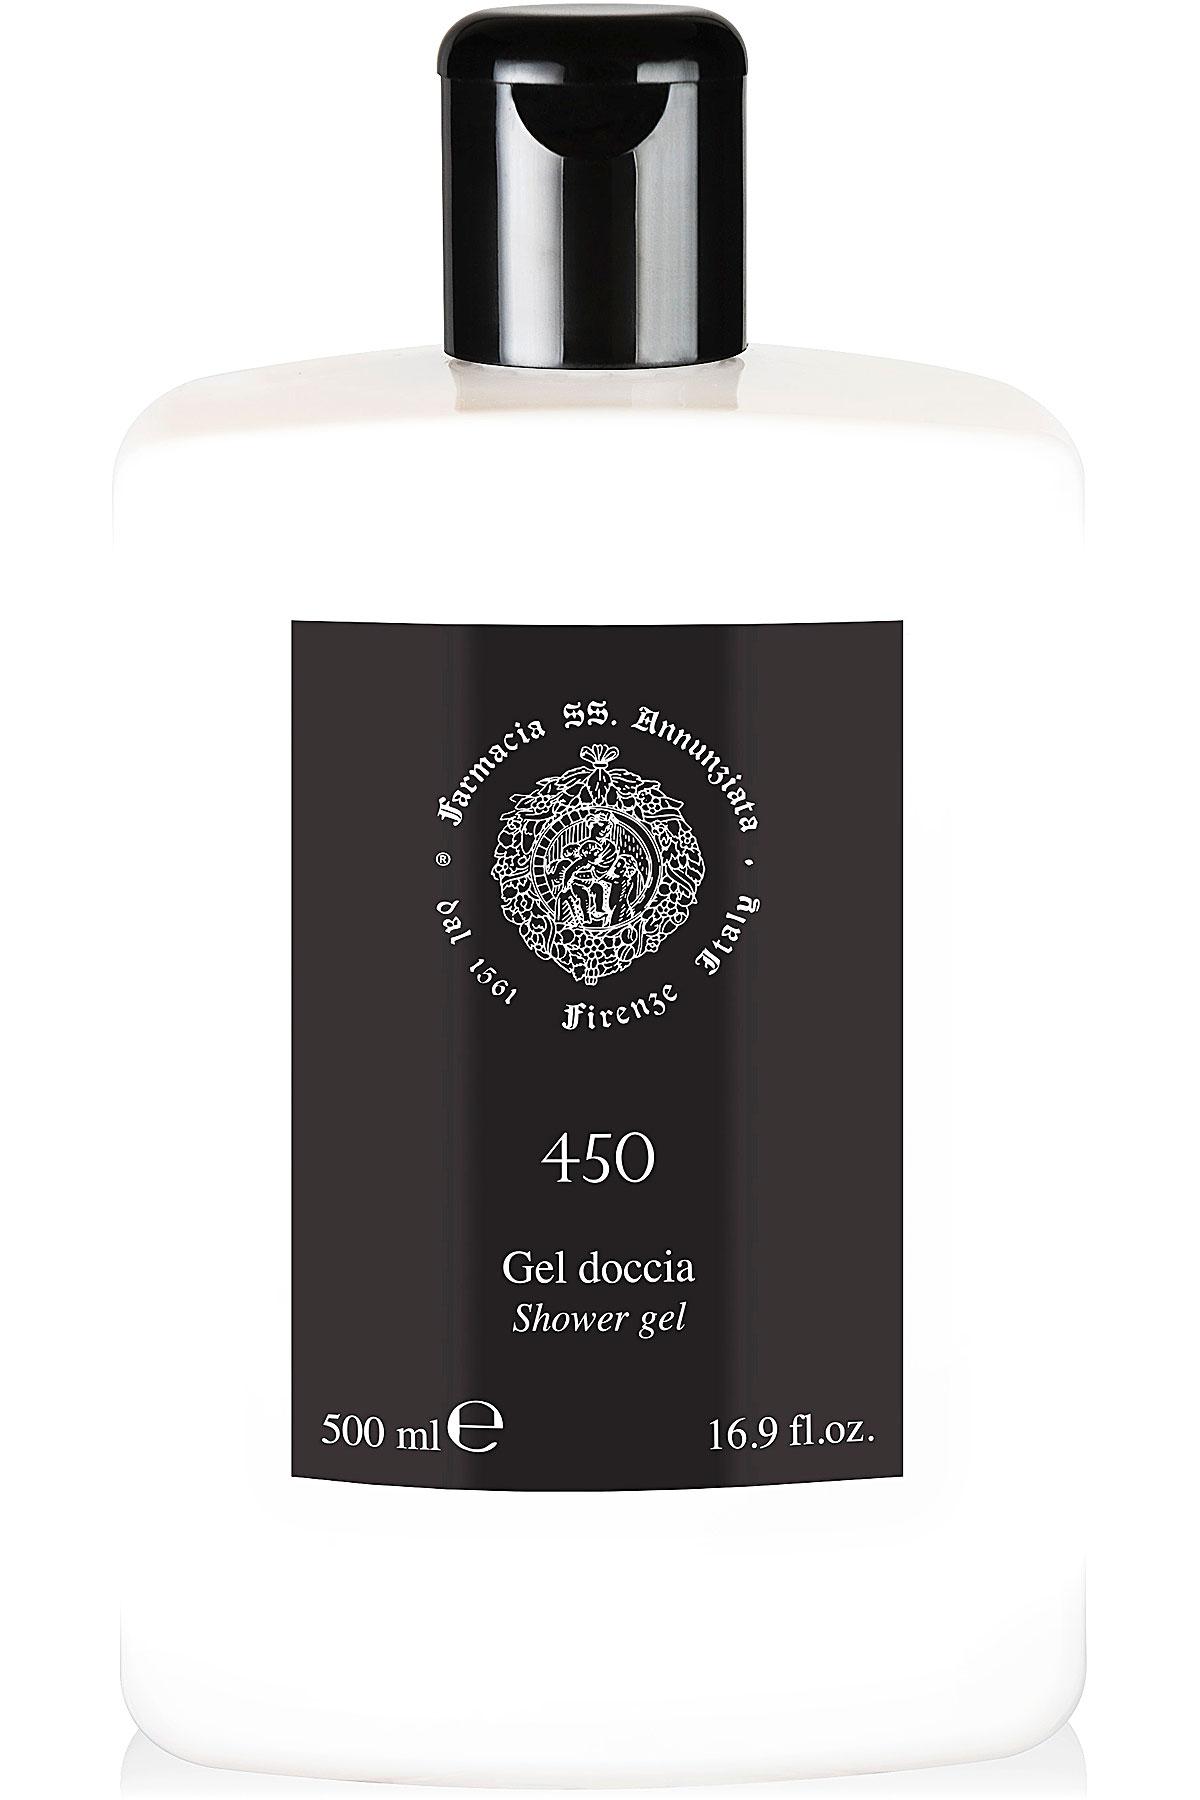 Farmacia Ss Annunziata 1561 Beauty for Women On Sale, 450 - Shower Gel - 500 Ml, 2019, 500 ml